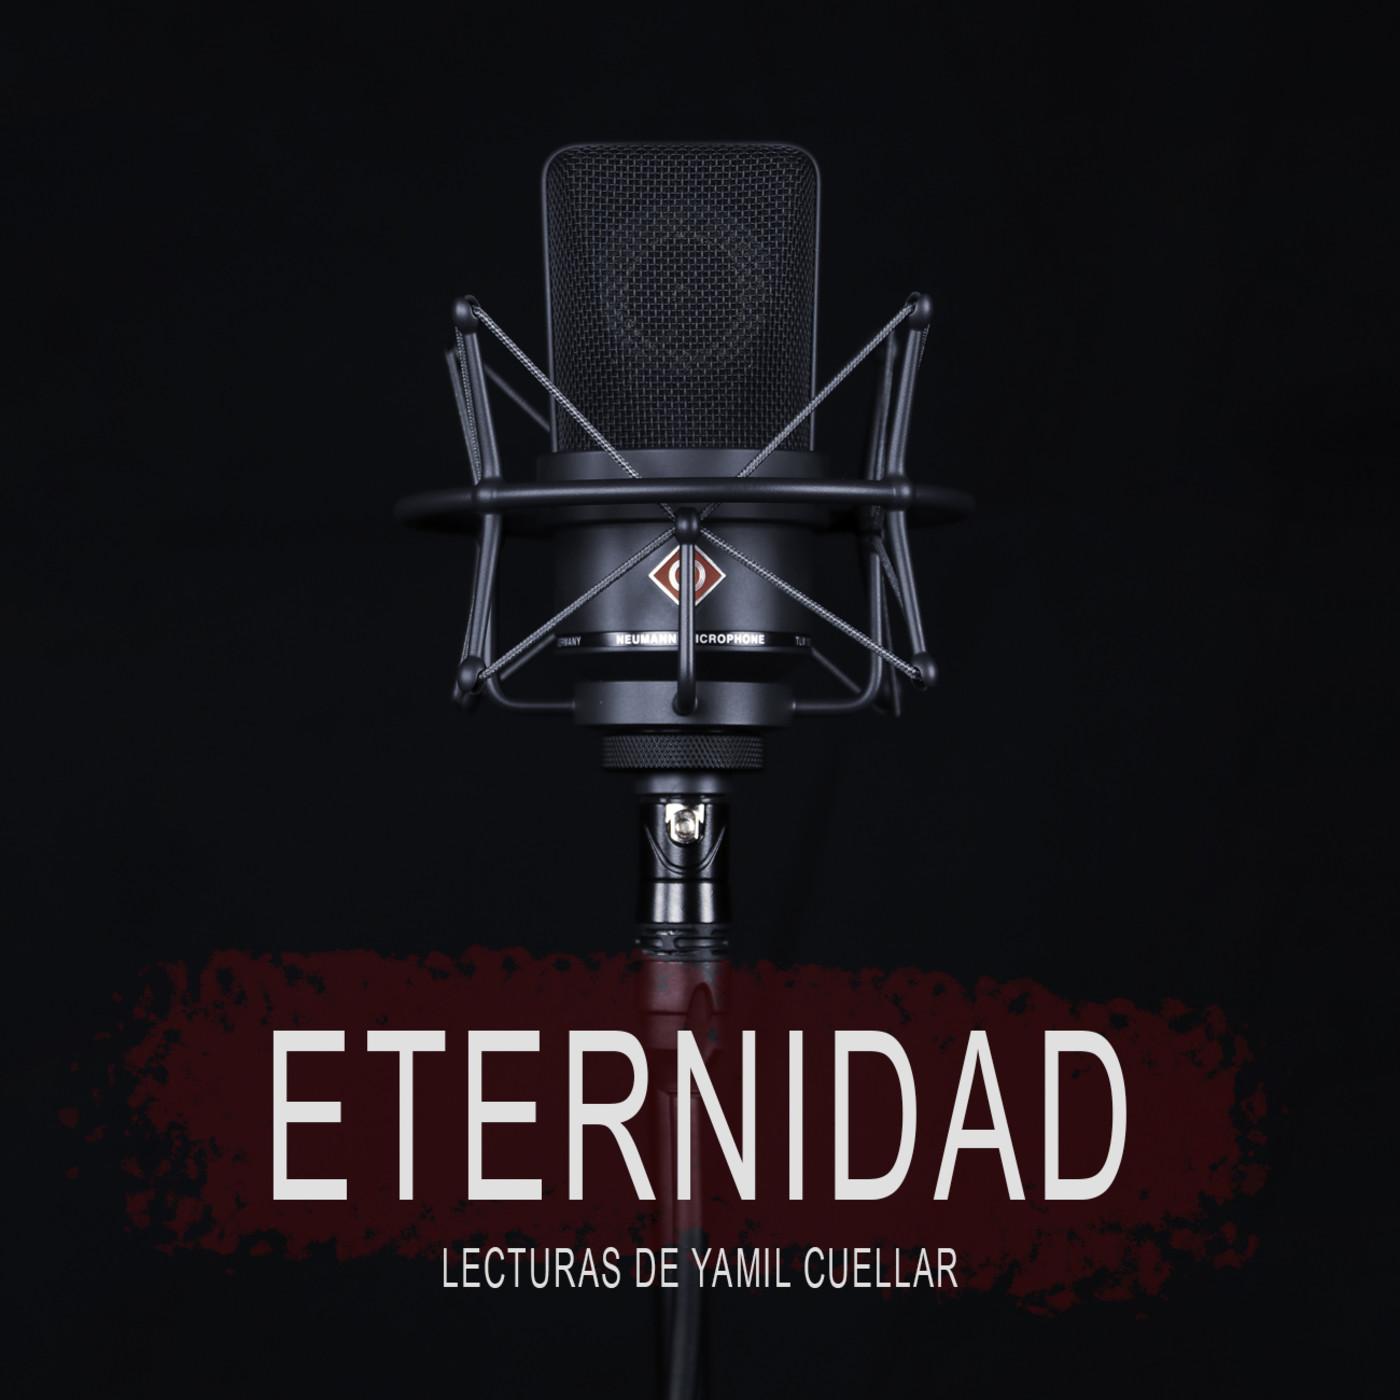 3-Eternidad